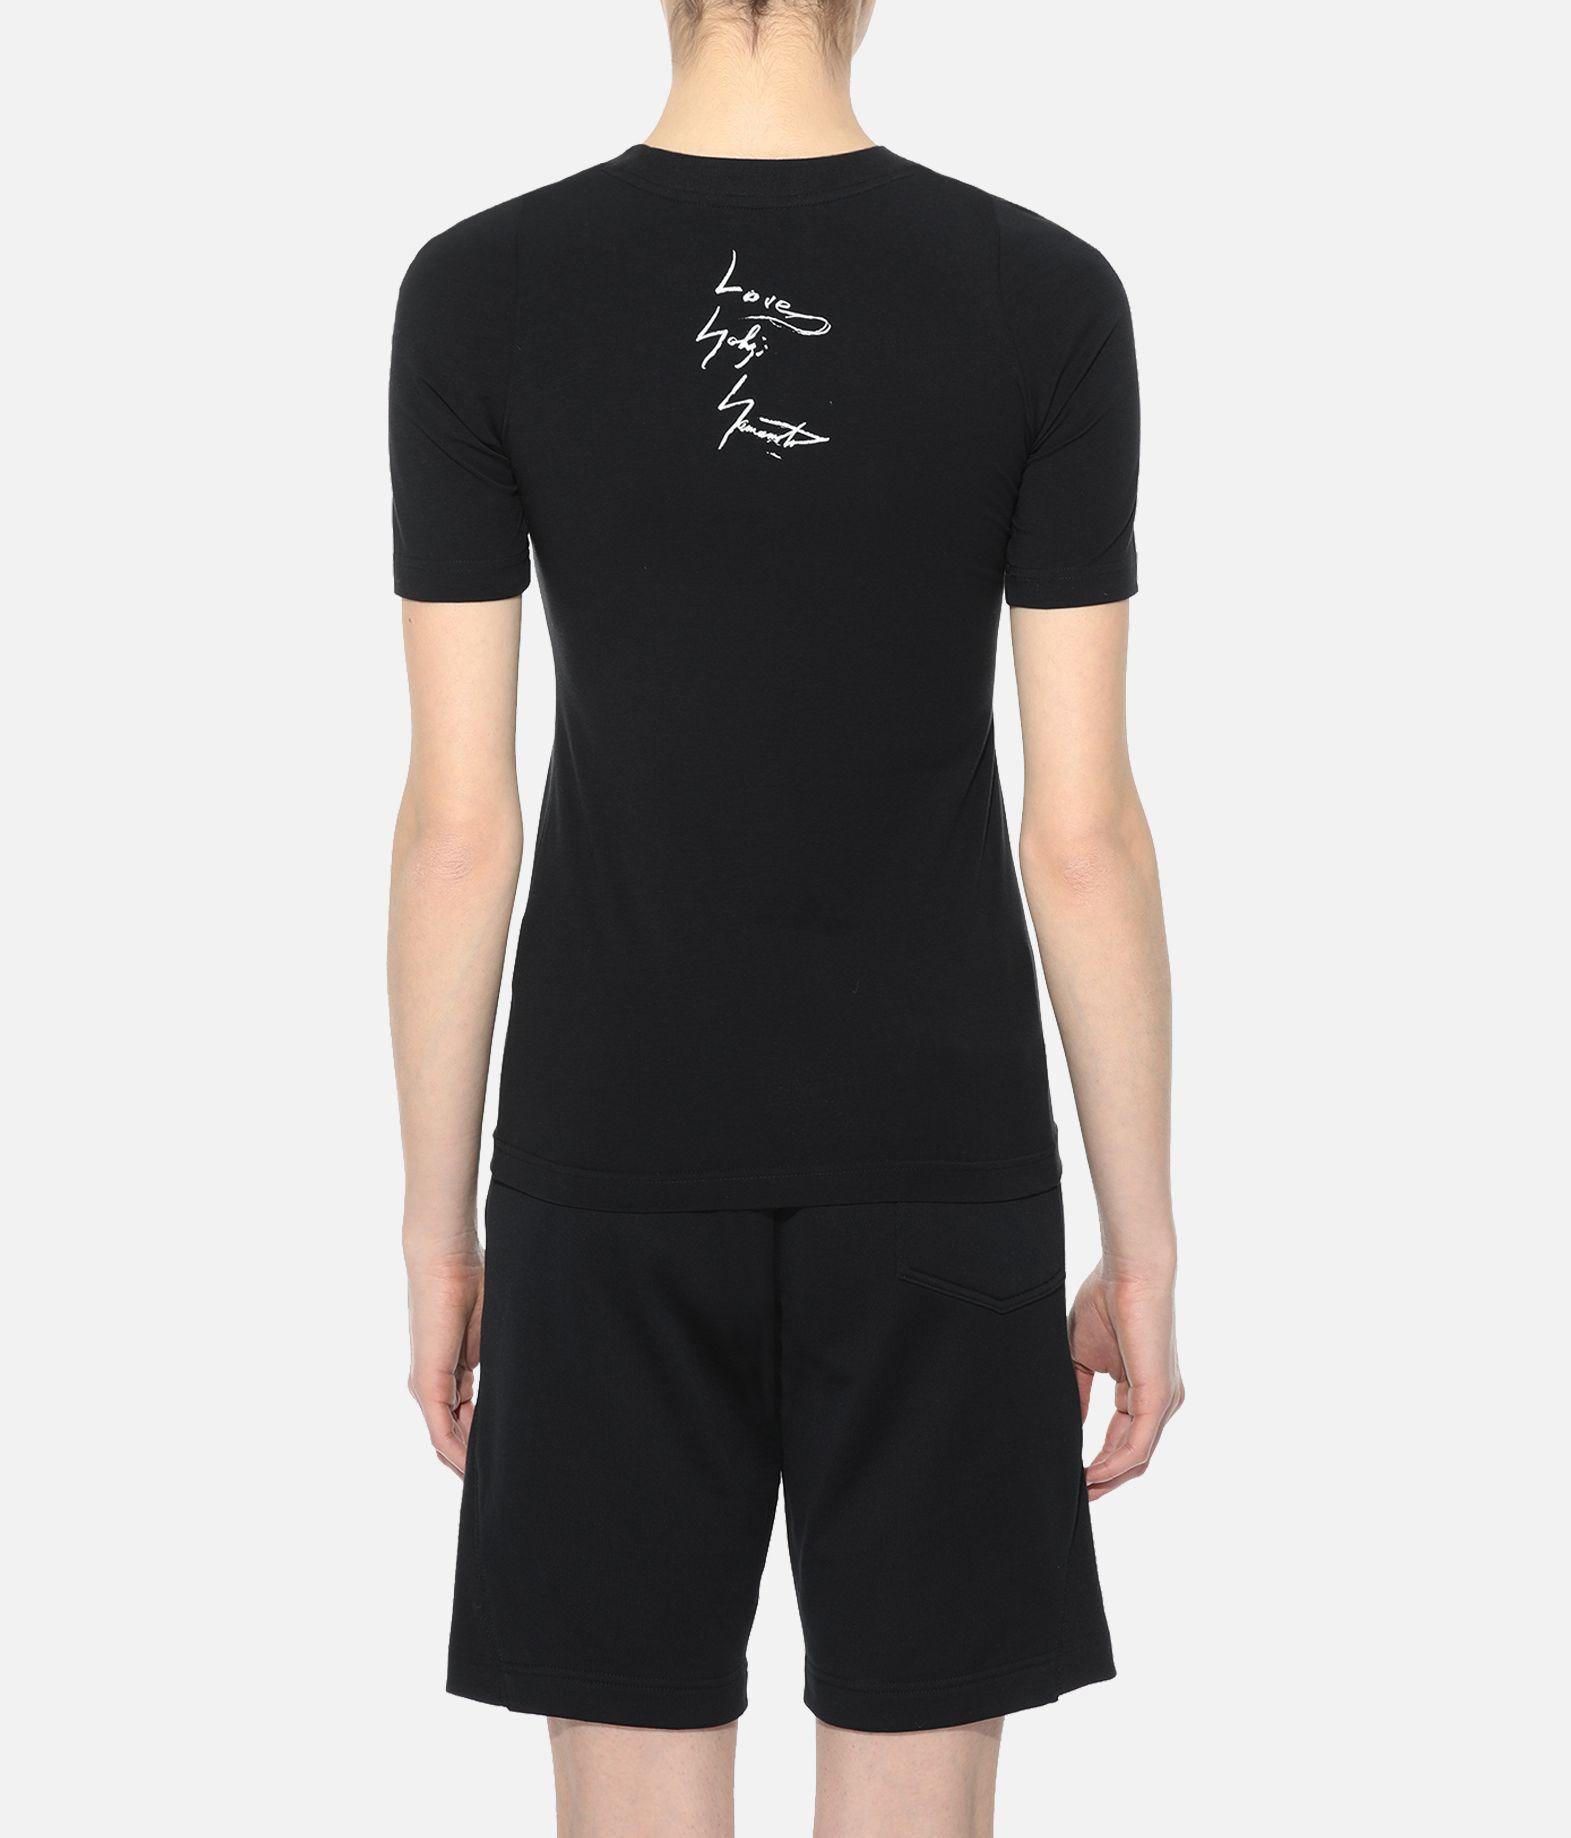 Y-3 Y-3 YOHJI TEE Kurzärmliges T-shirt Damen r